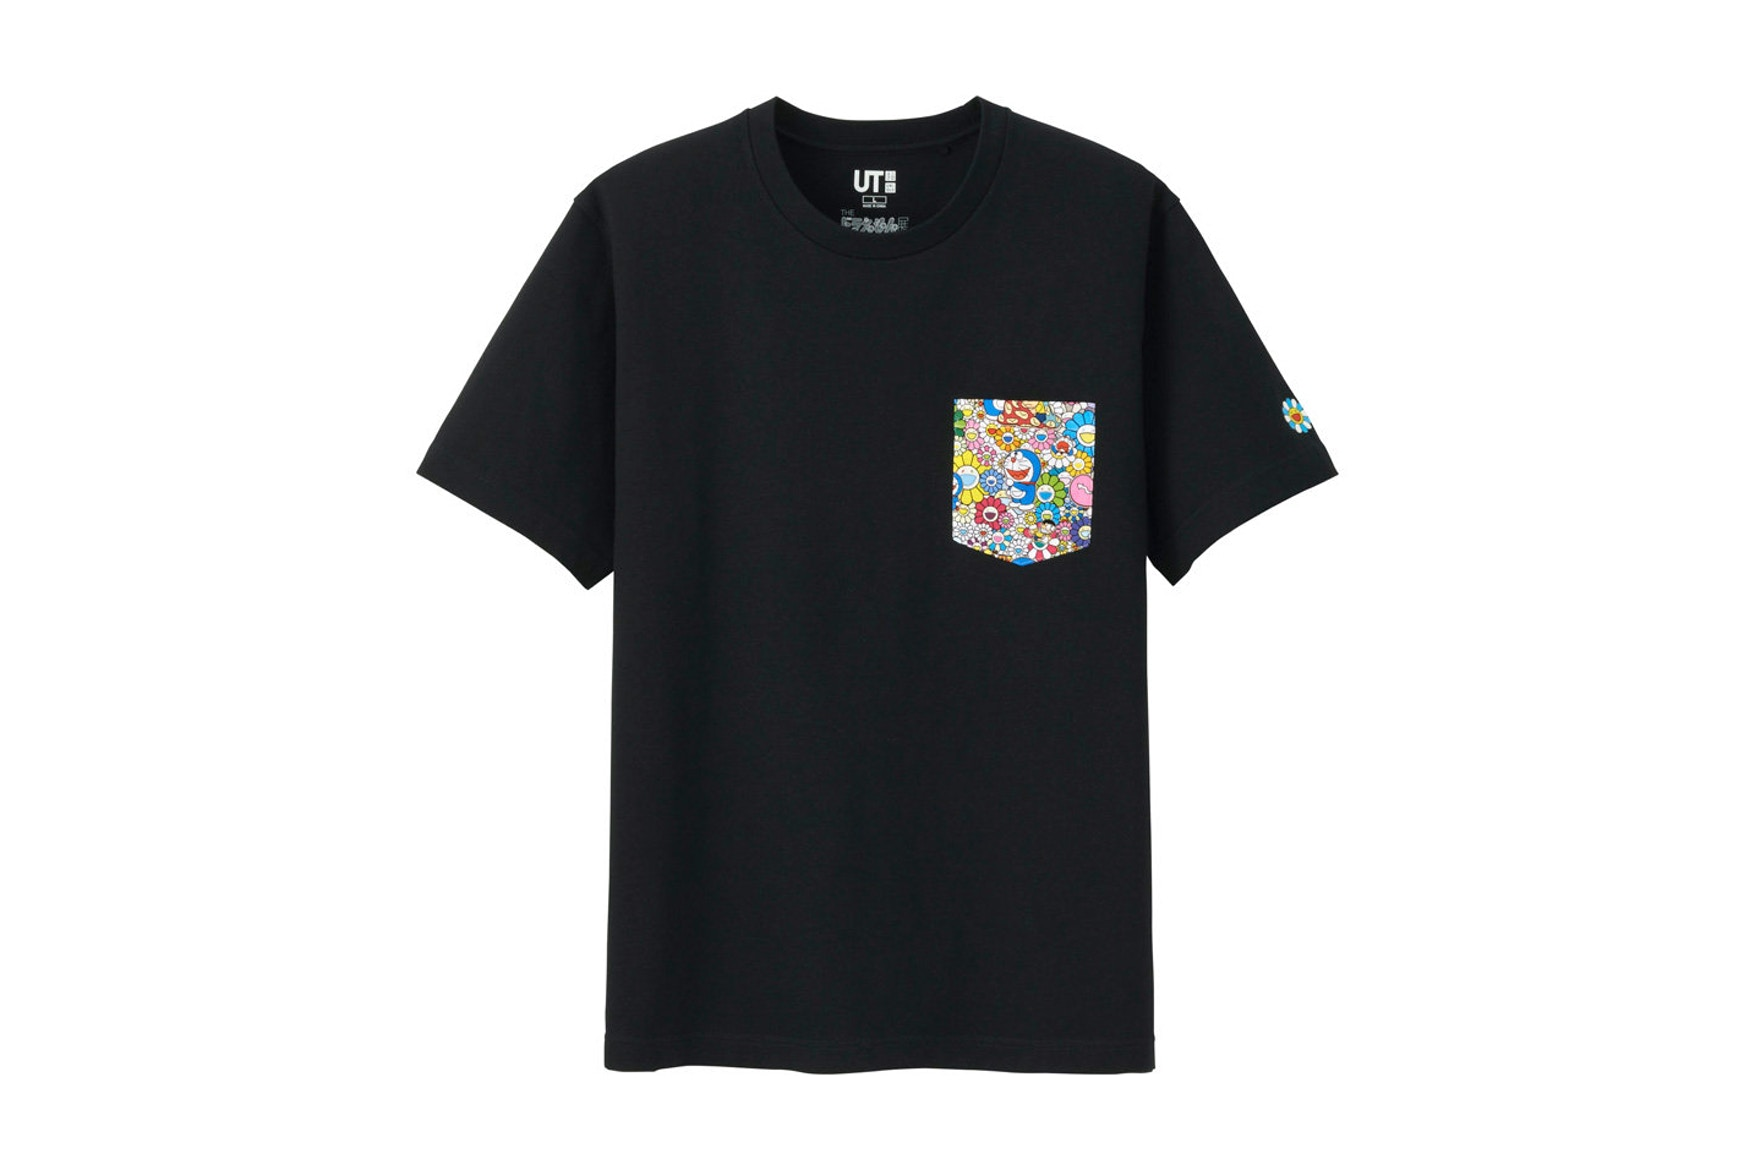 takashi-murakami-doraemon-uniqlo-ut-collection-3